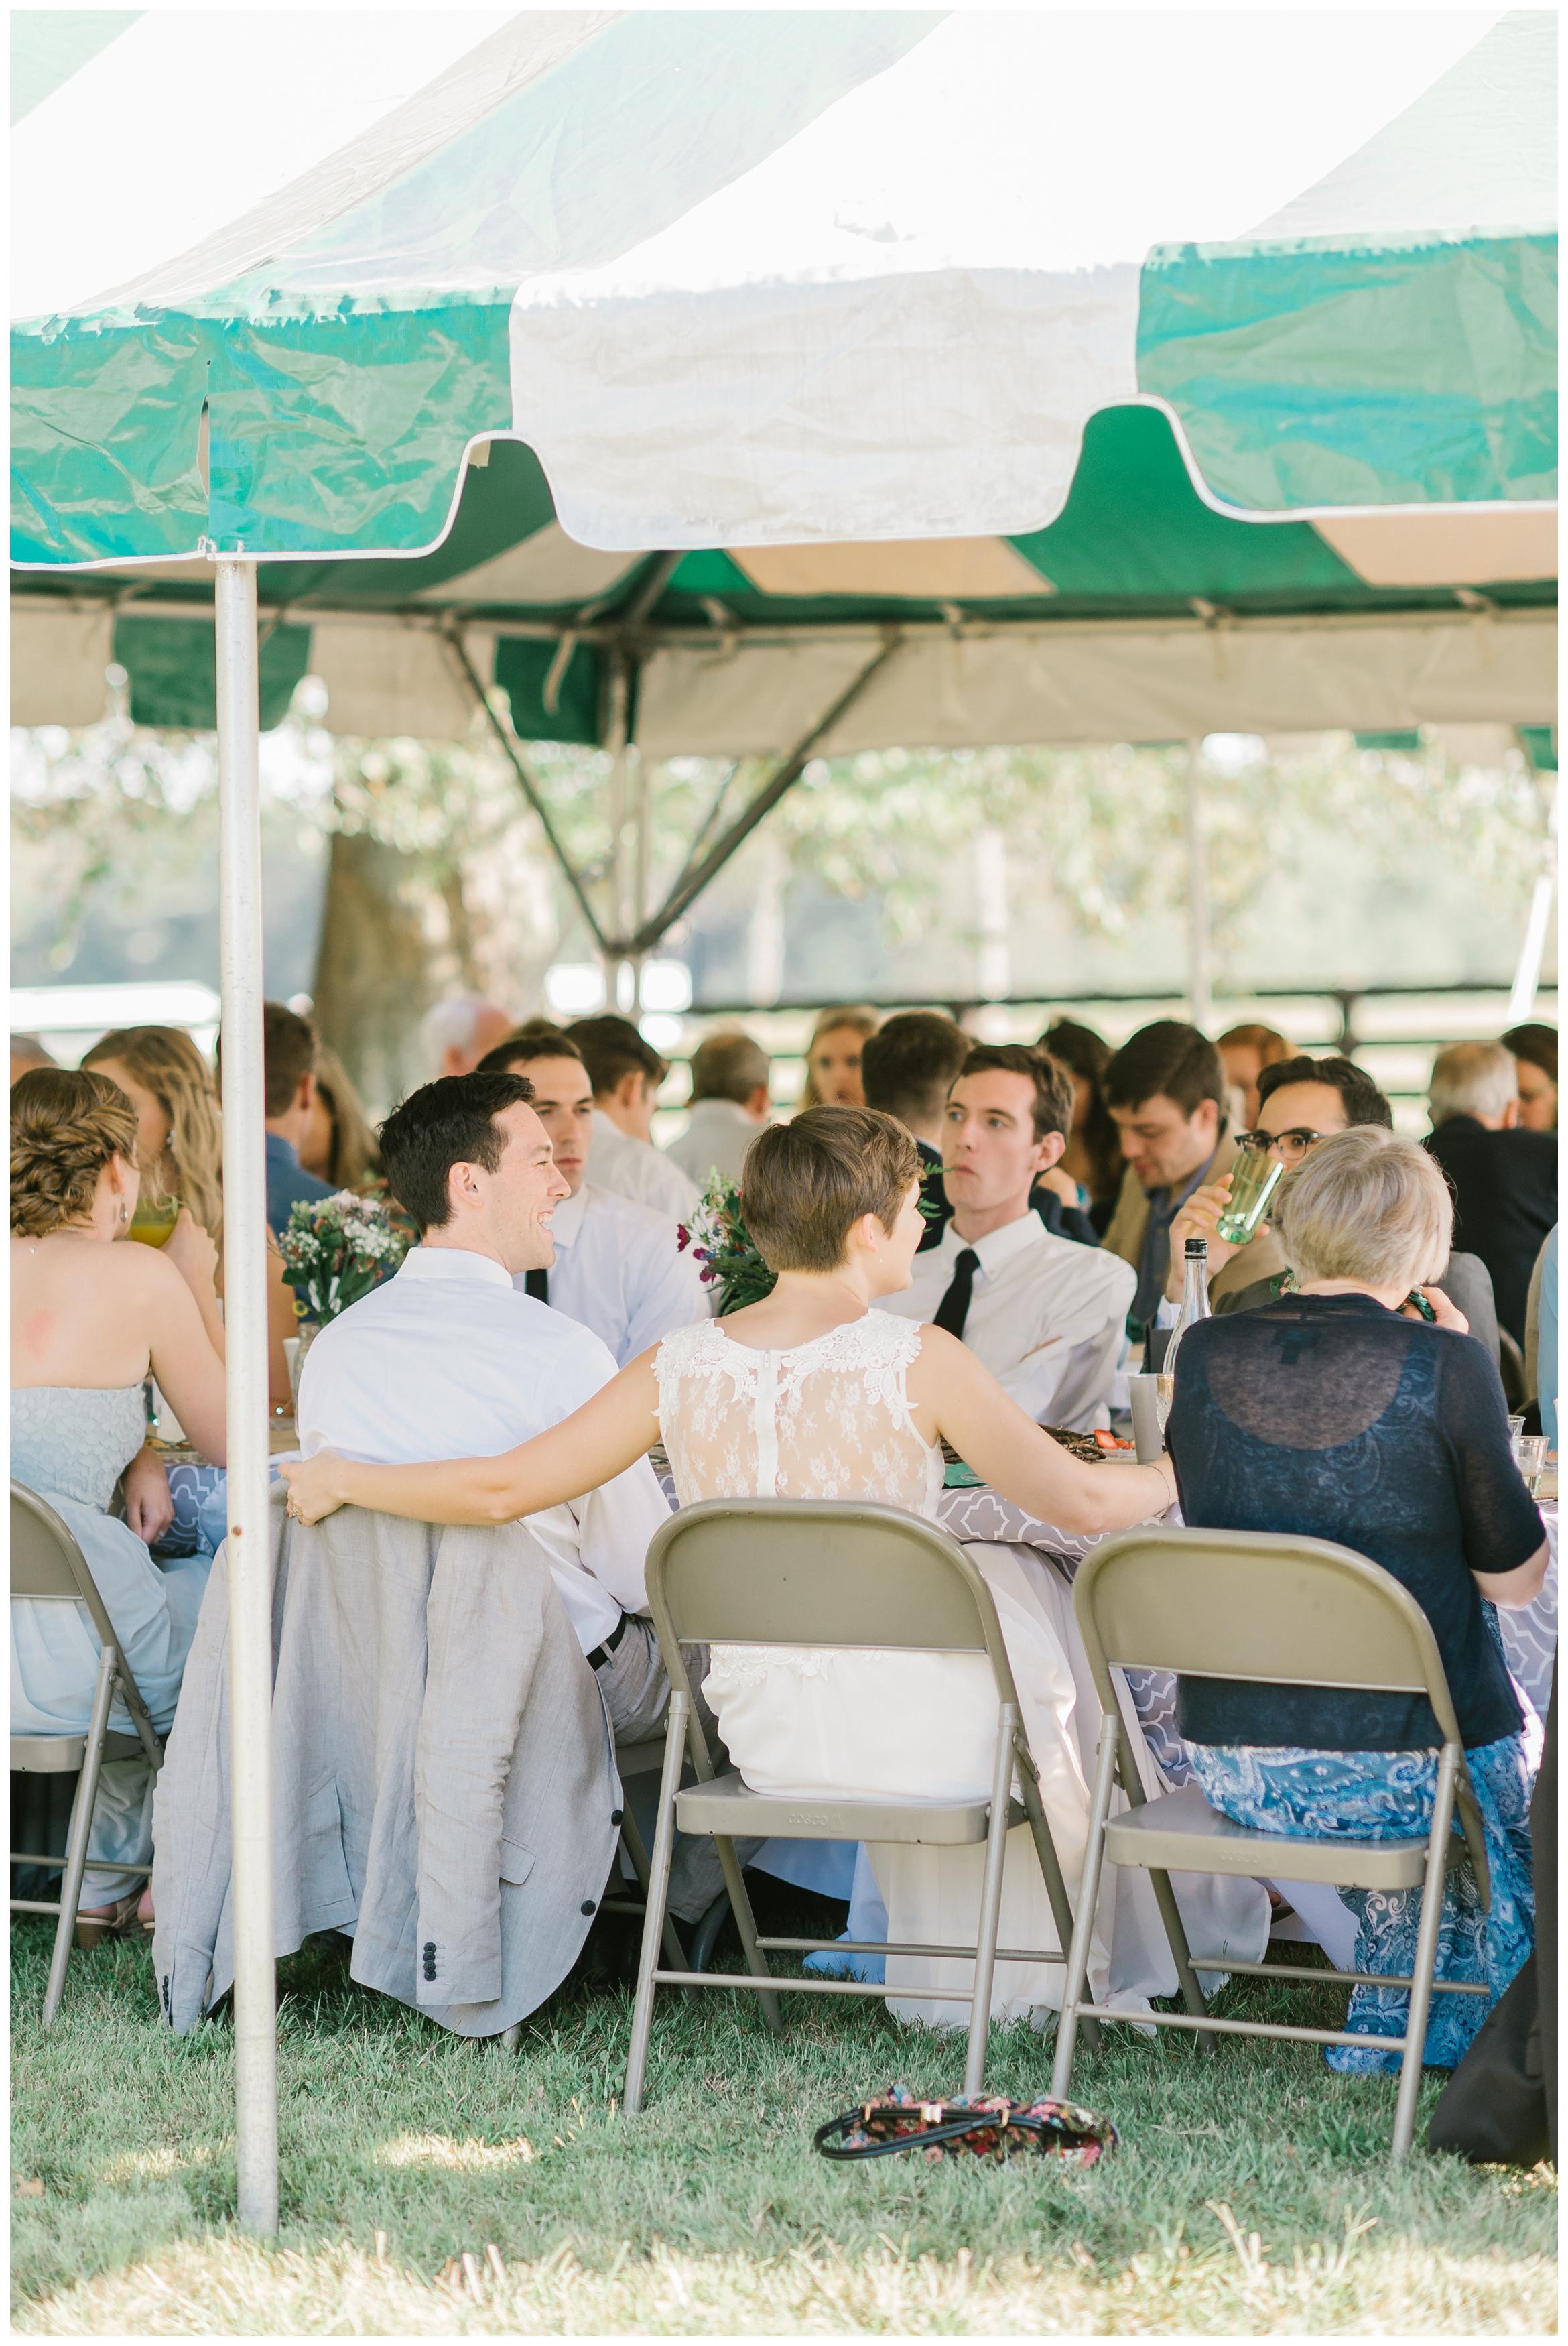 Rebecca_Shehorn_Photography_Indianapolis_Wedding_Photographer_7272.jpg